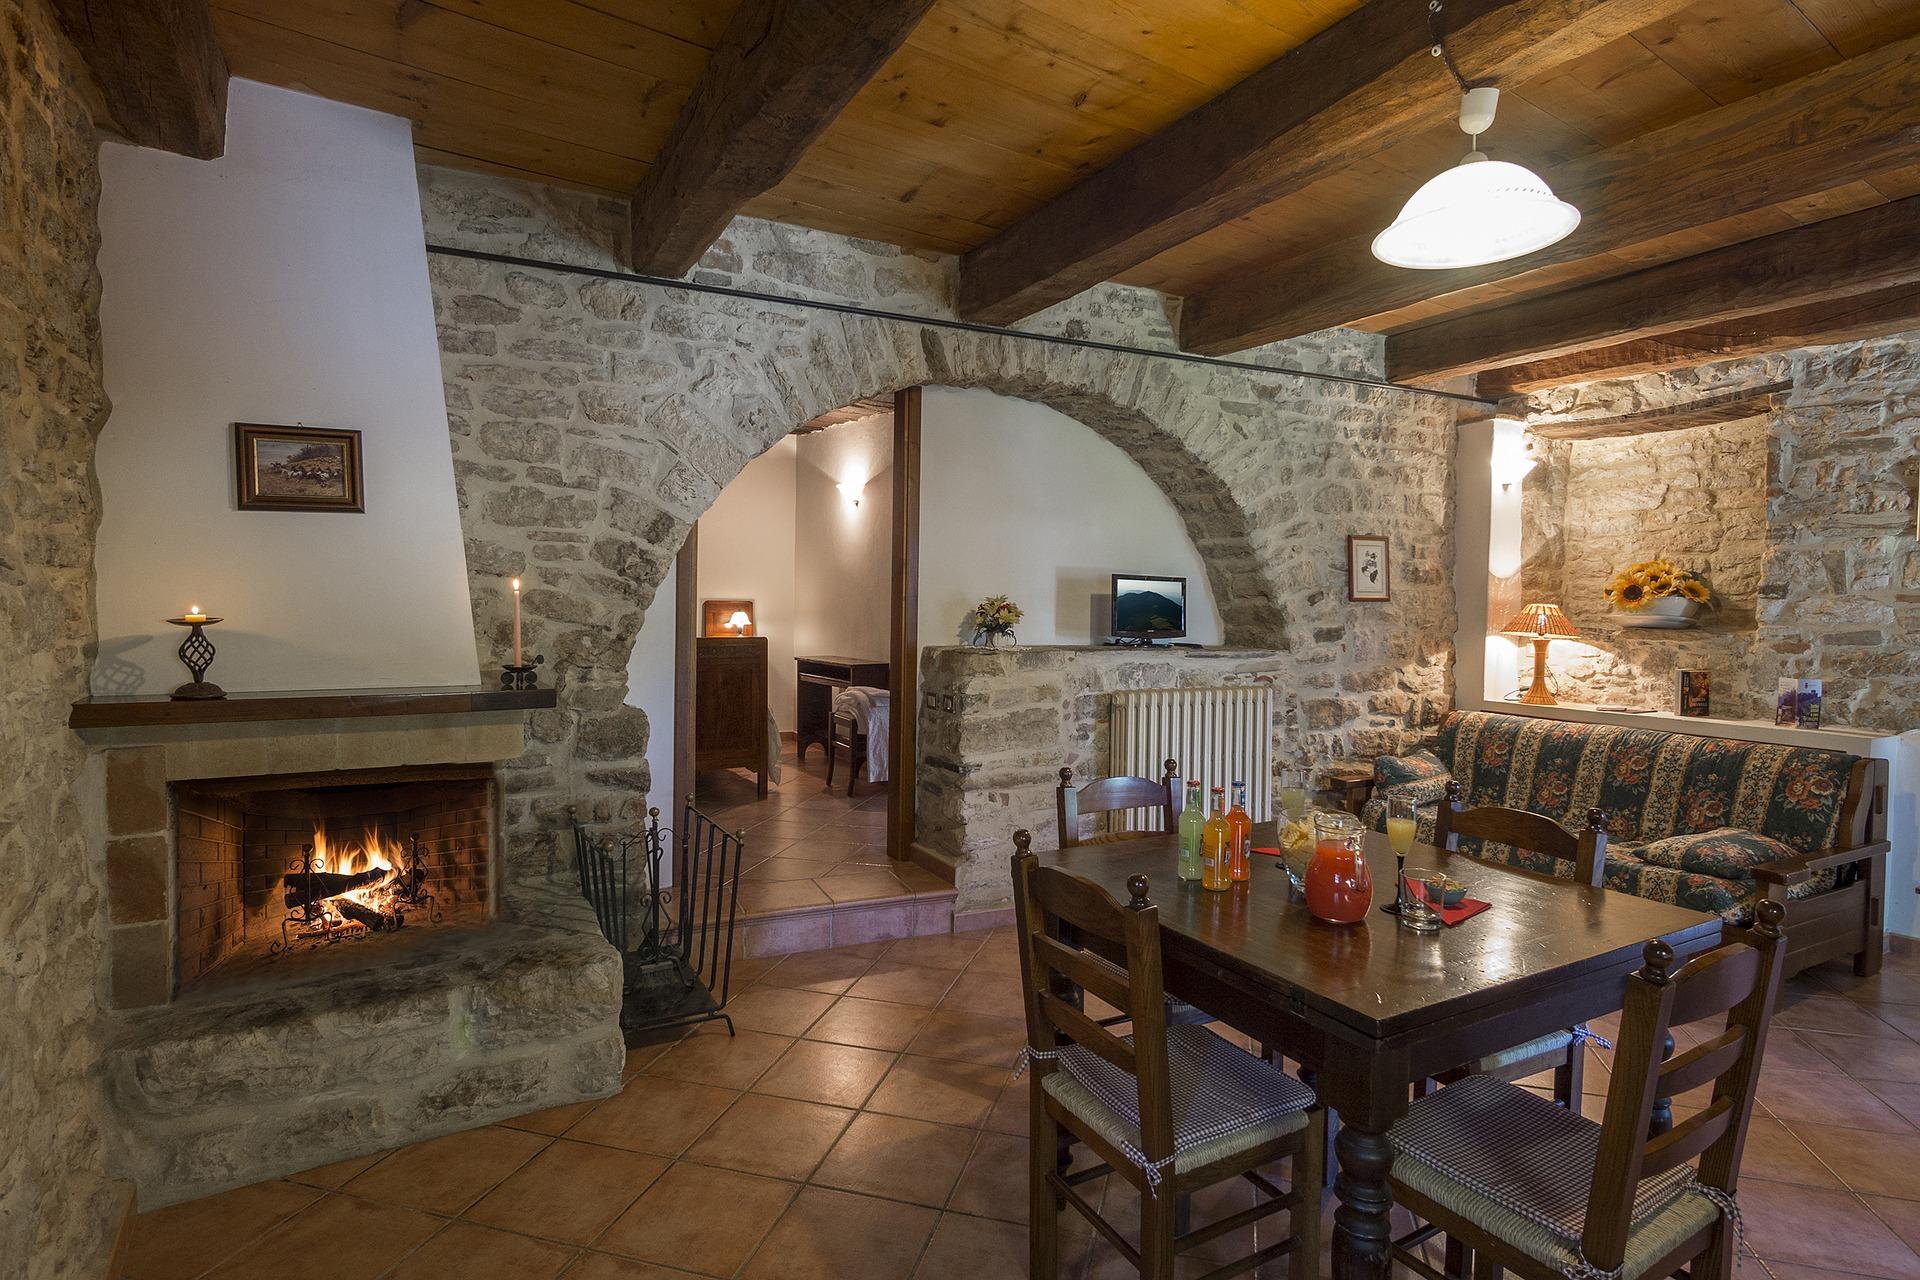 ramonage cheminée Morsang-sur-Orge 91390